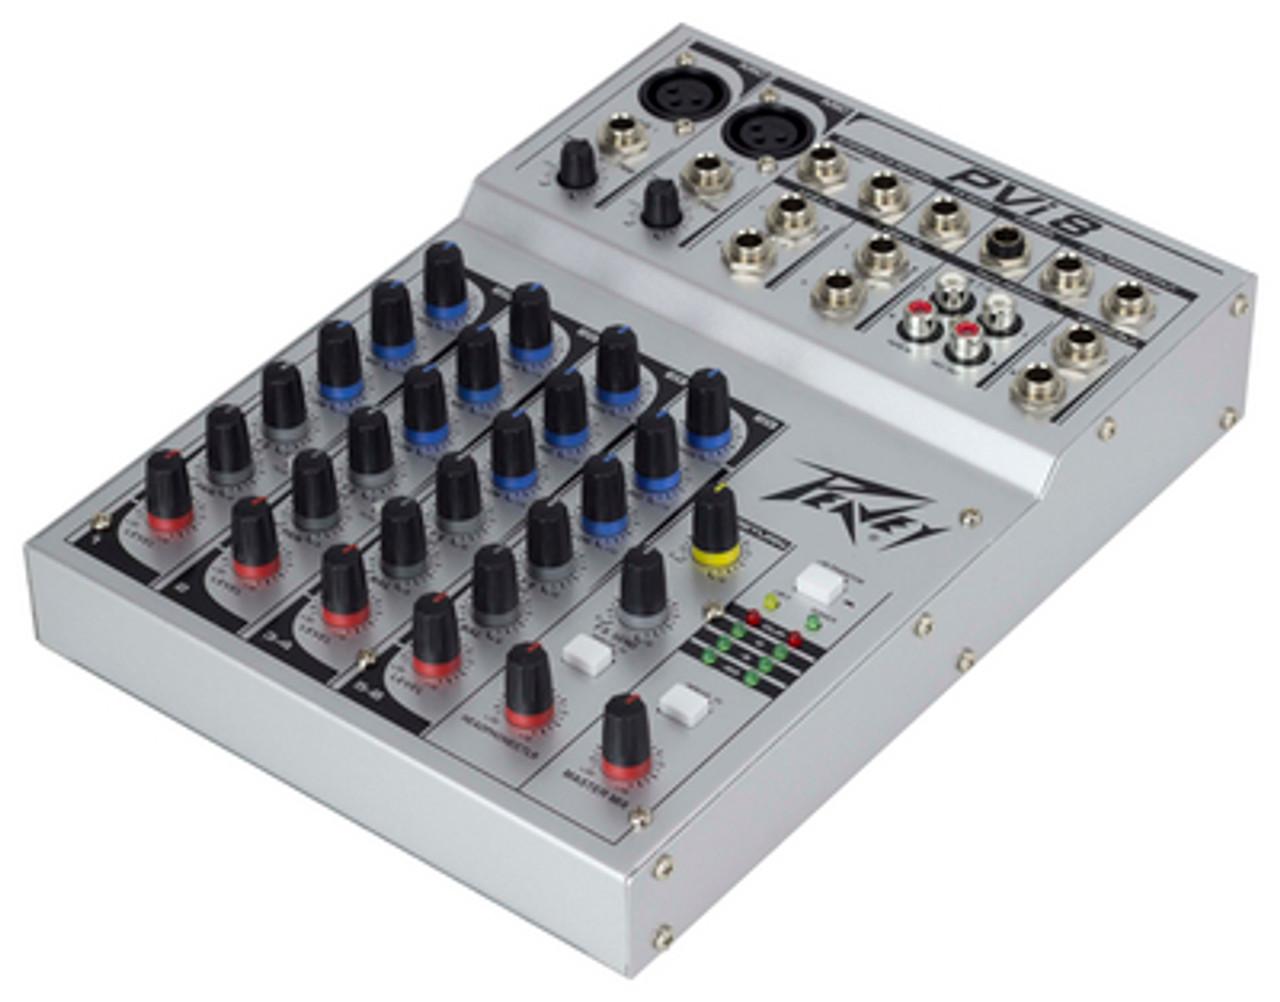 PVi-8